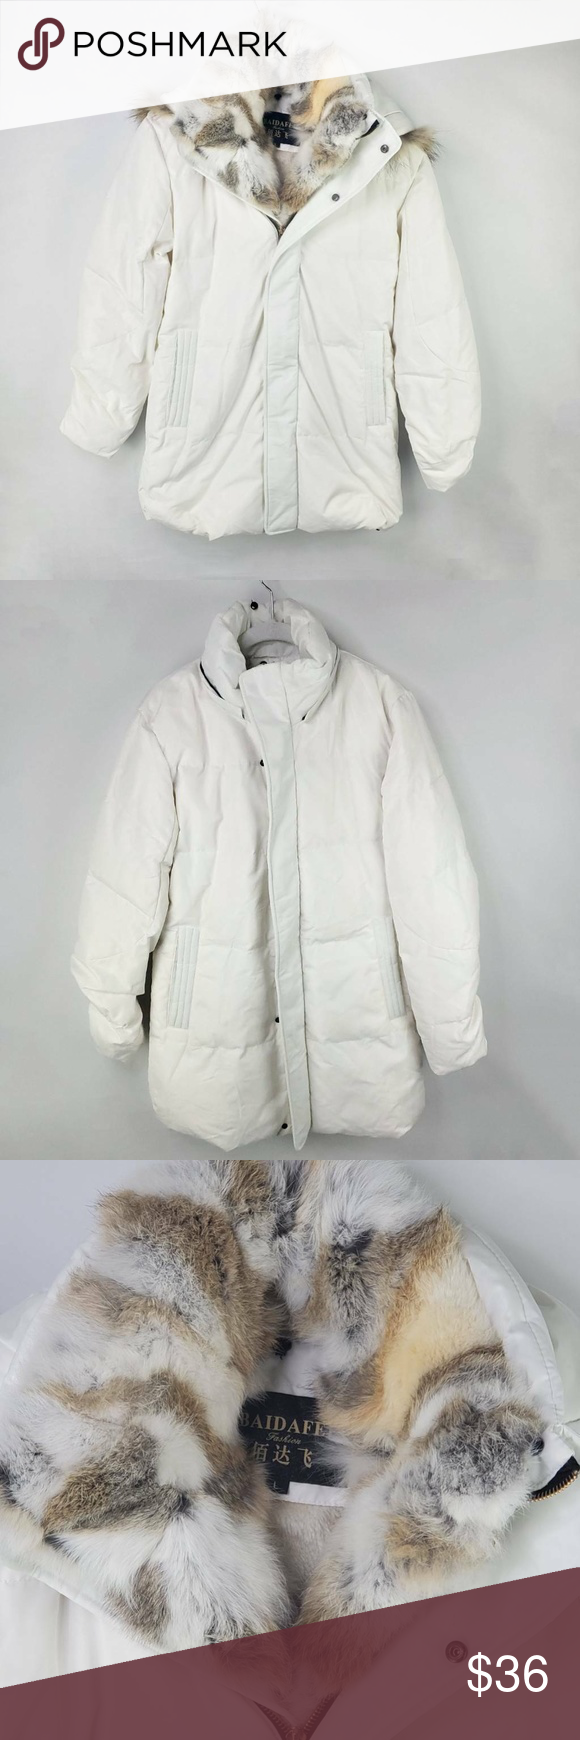 Baidafei Womens Puffer Jacket White Fur Lined Hood Puffer Jacket Women Puffer Jackets Jackets [ 1740 x 580 Pixel ]